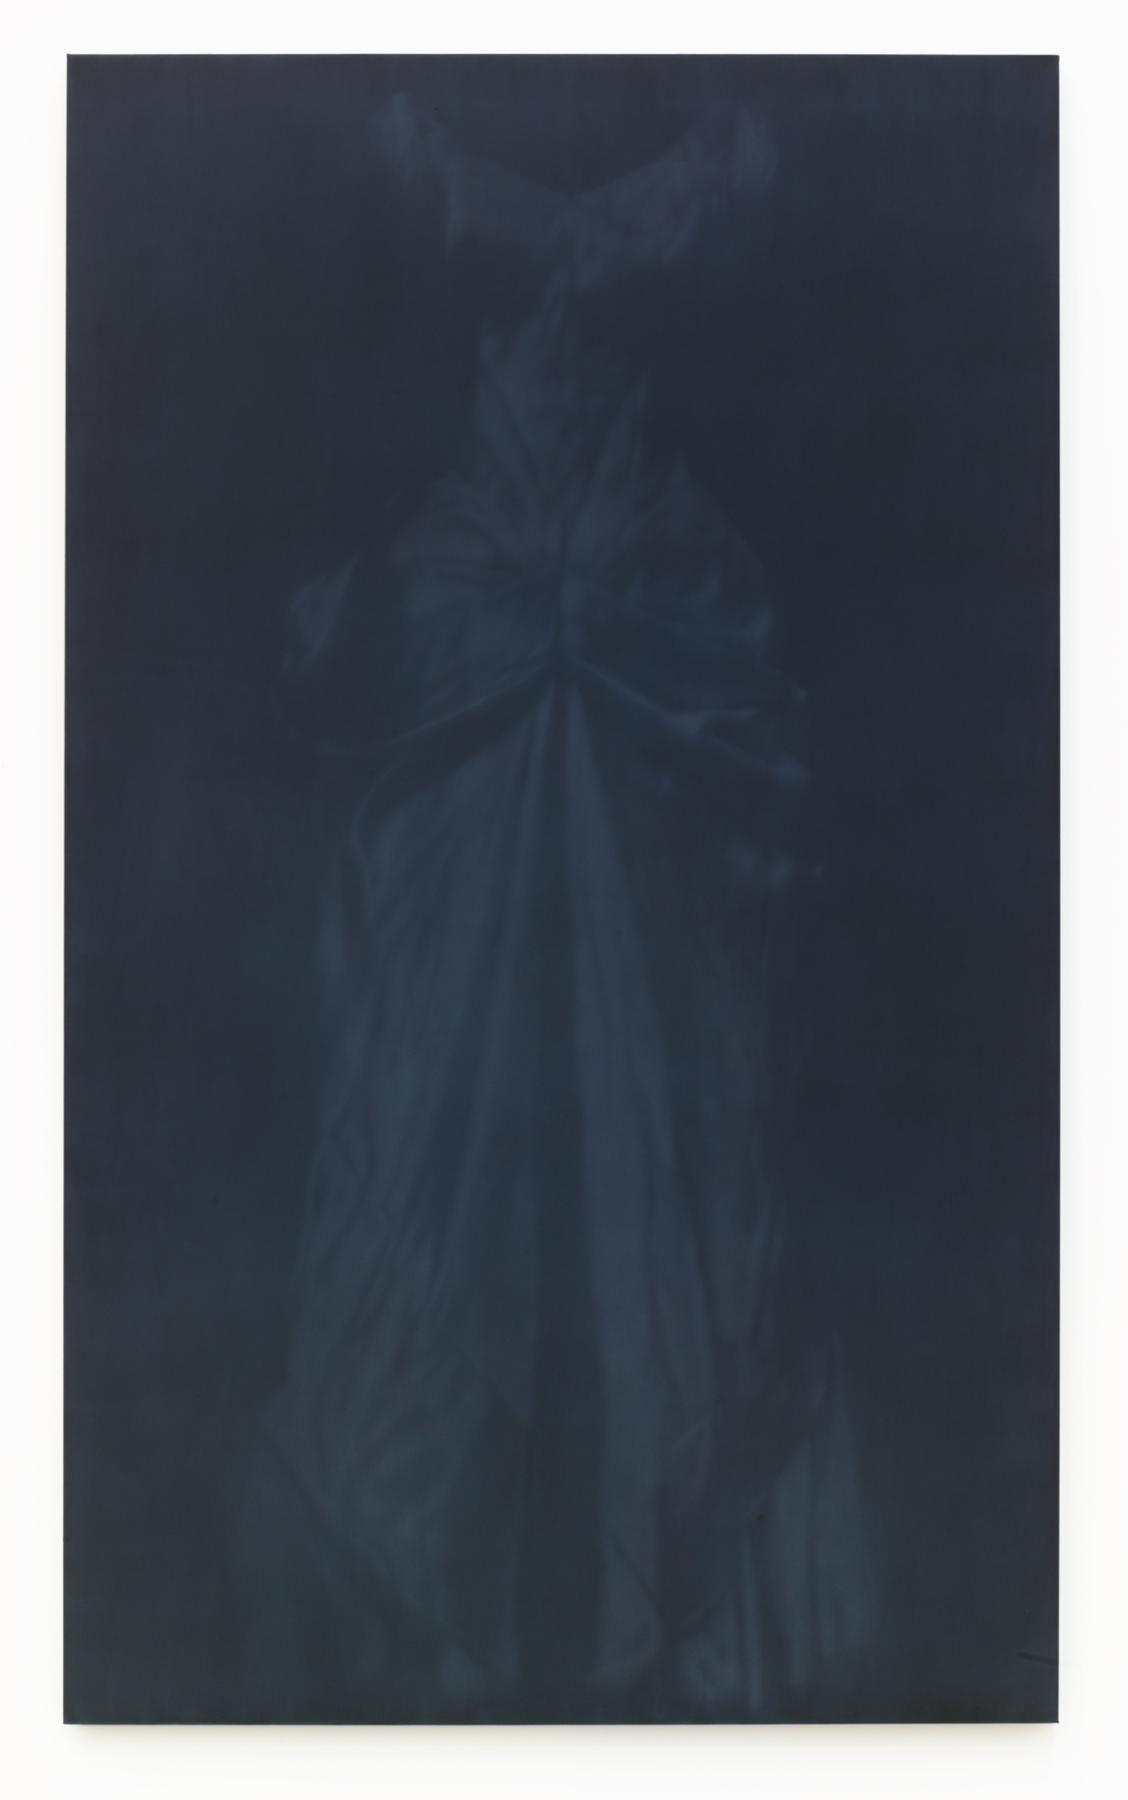 Untitled (Dress 1)